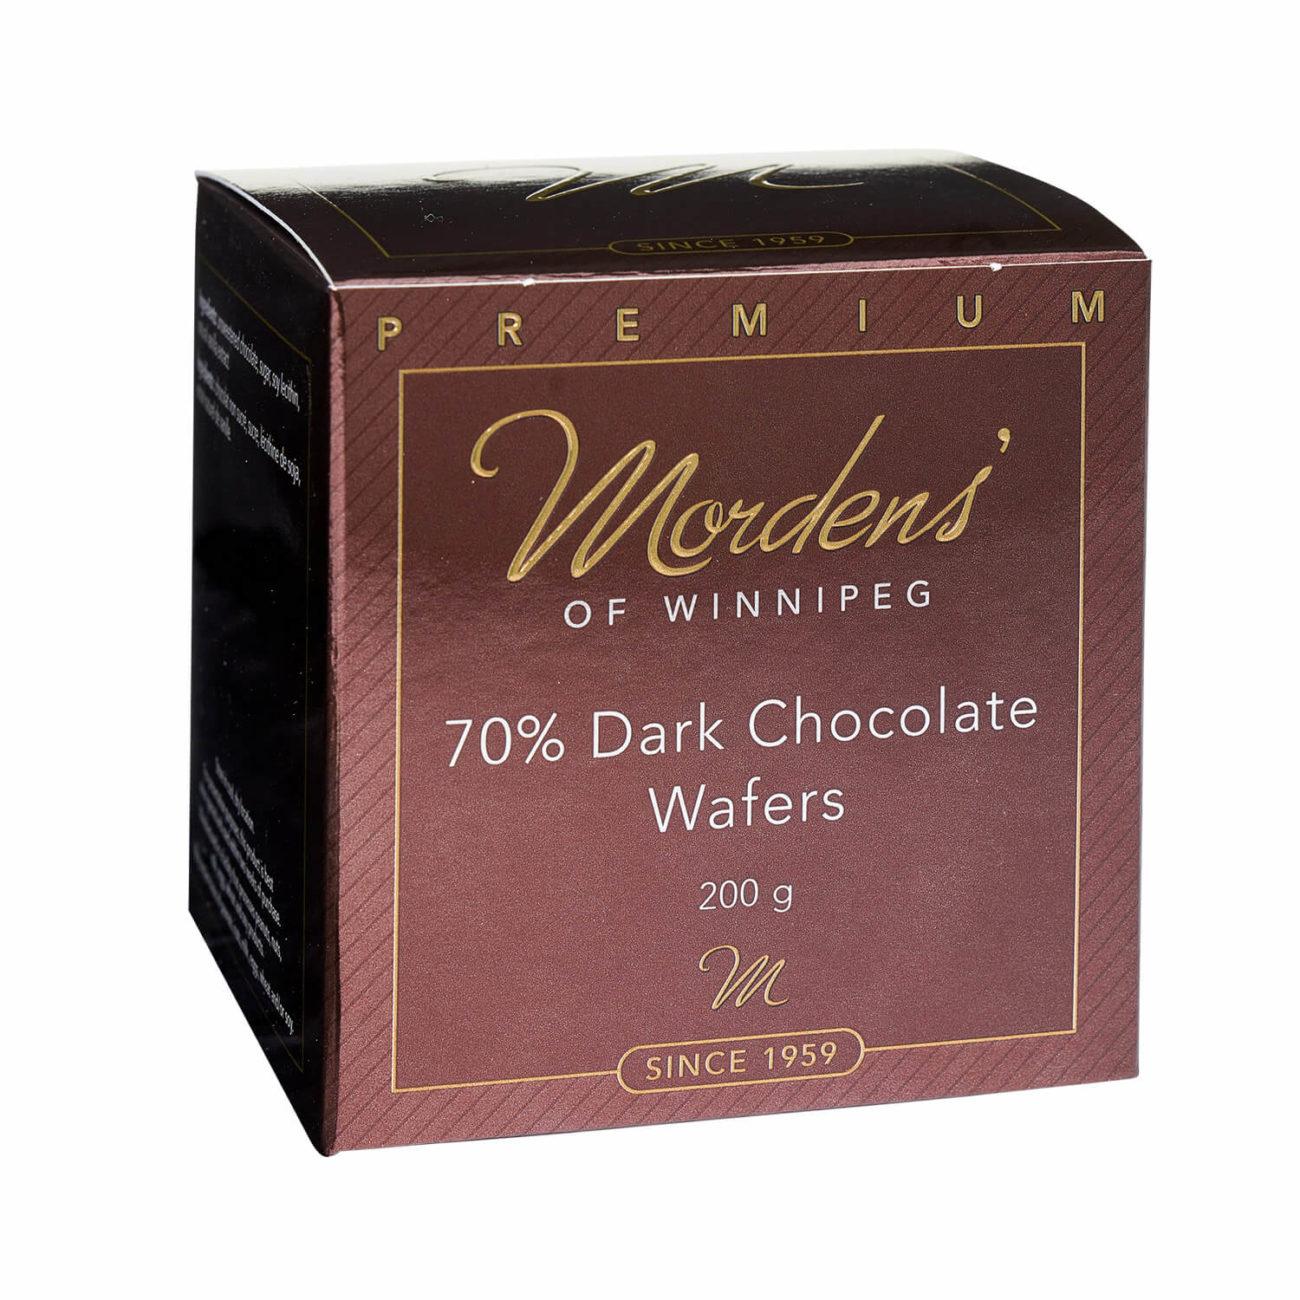 70% Dark Chocolate Wafers